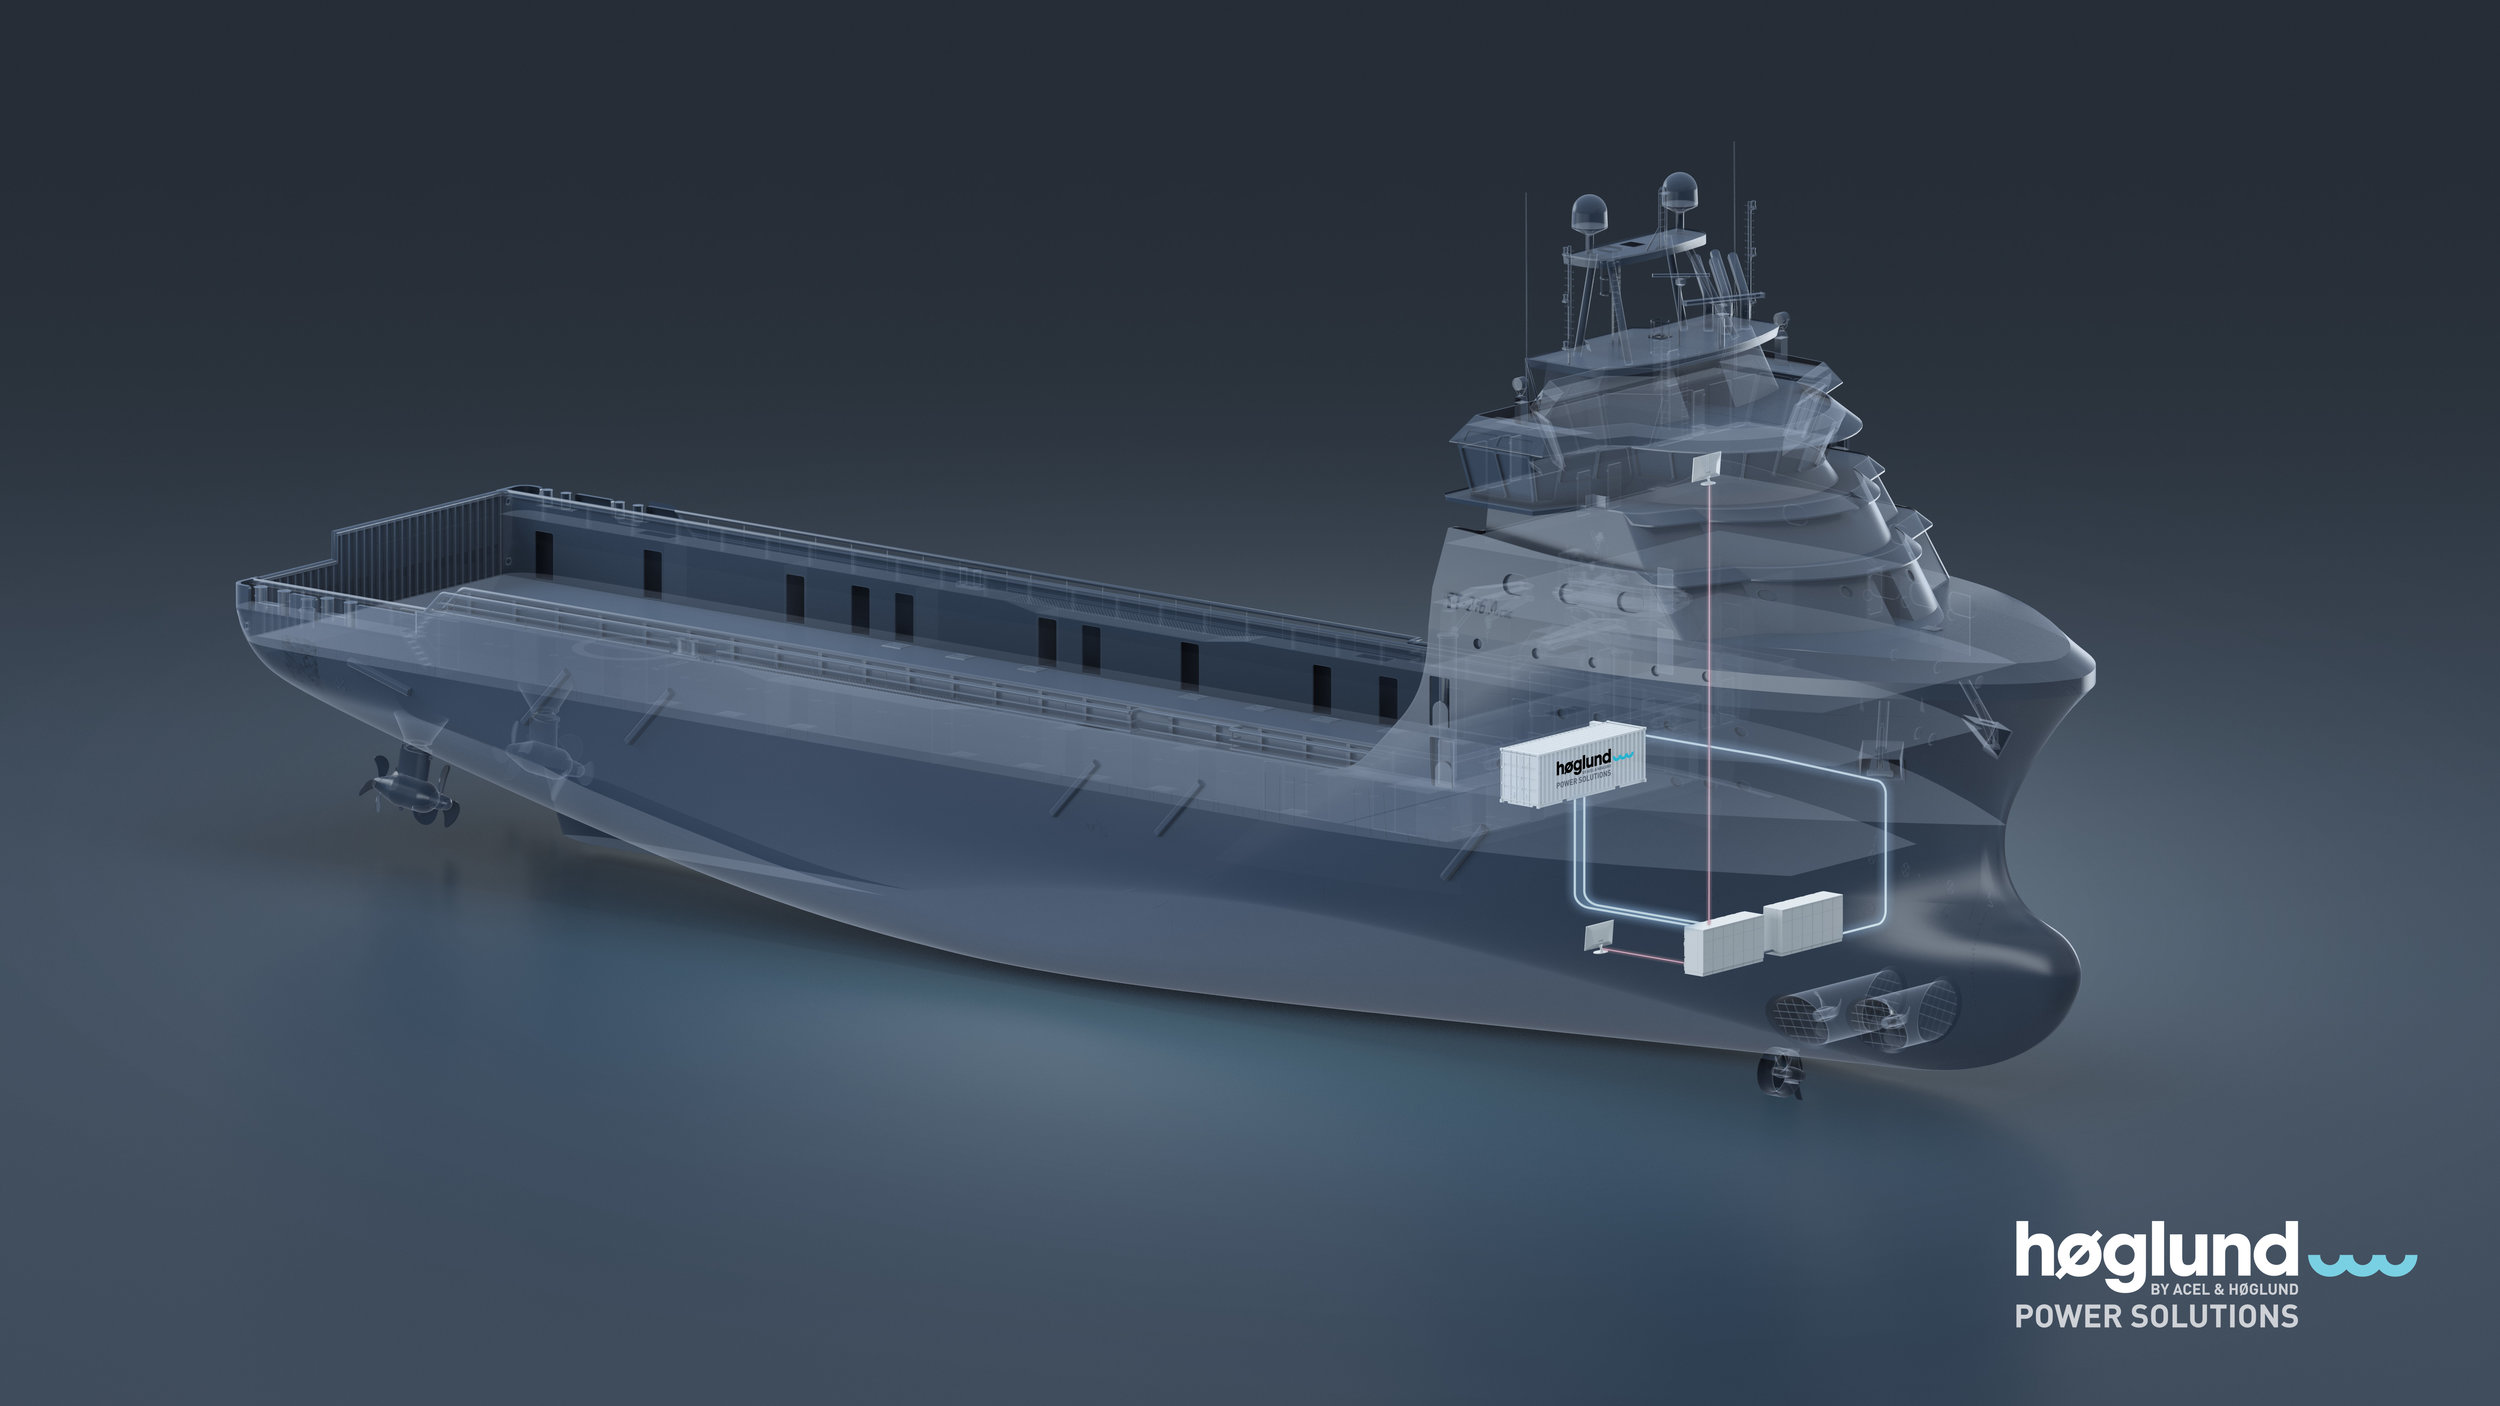 Høglund Power Solutions - Energy Storage System on a platform supply vessel